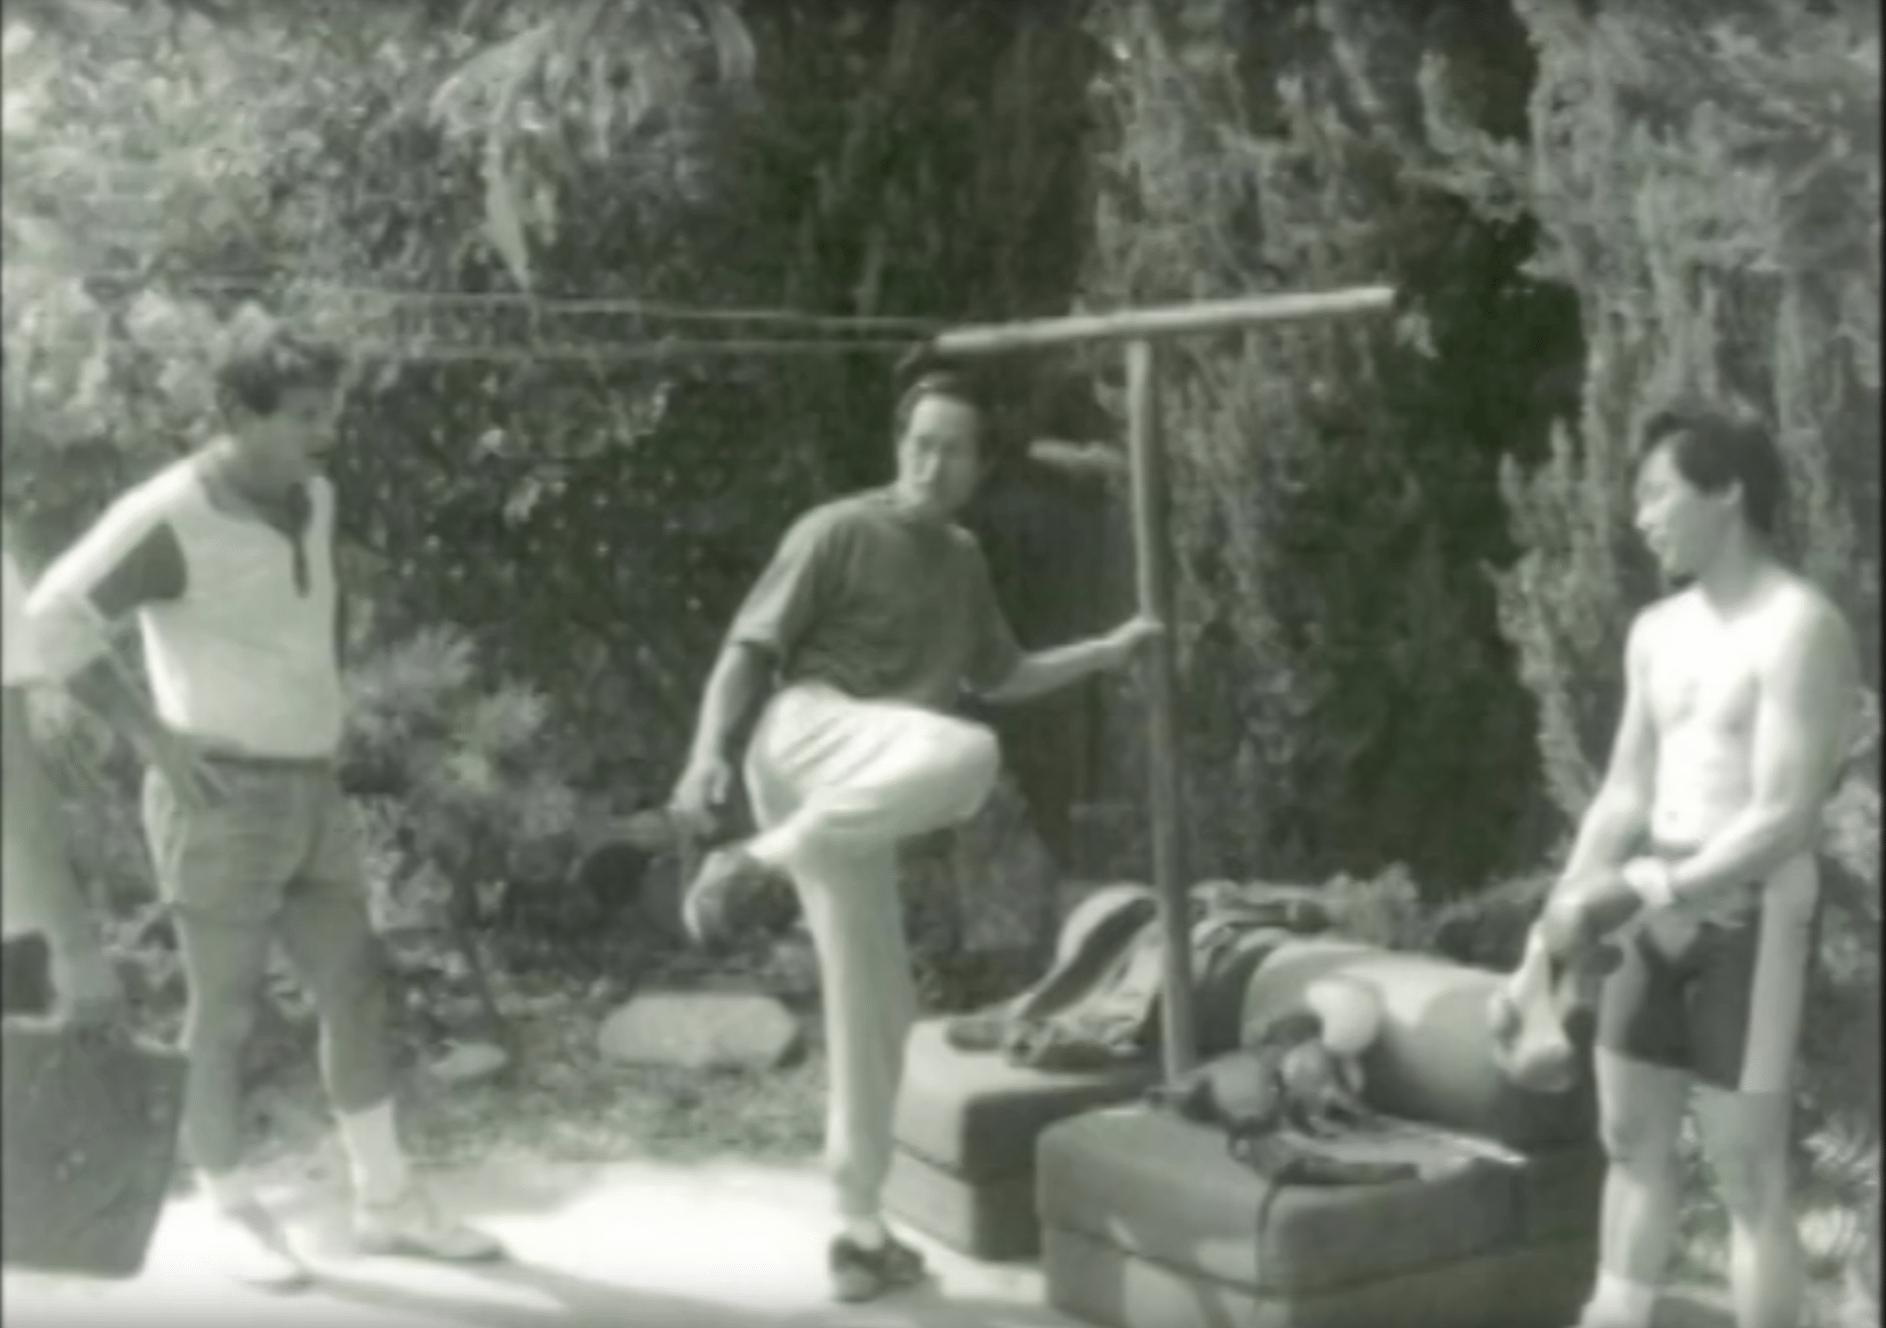 The Original JKD & JKD Concepts Training Regimen – Jeet Kune Do